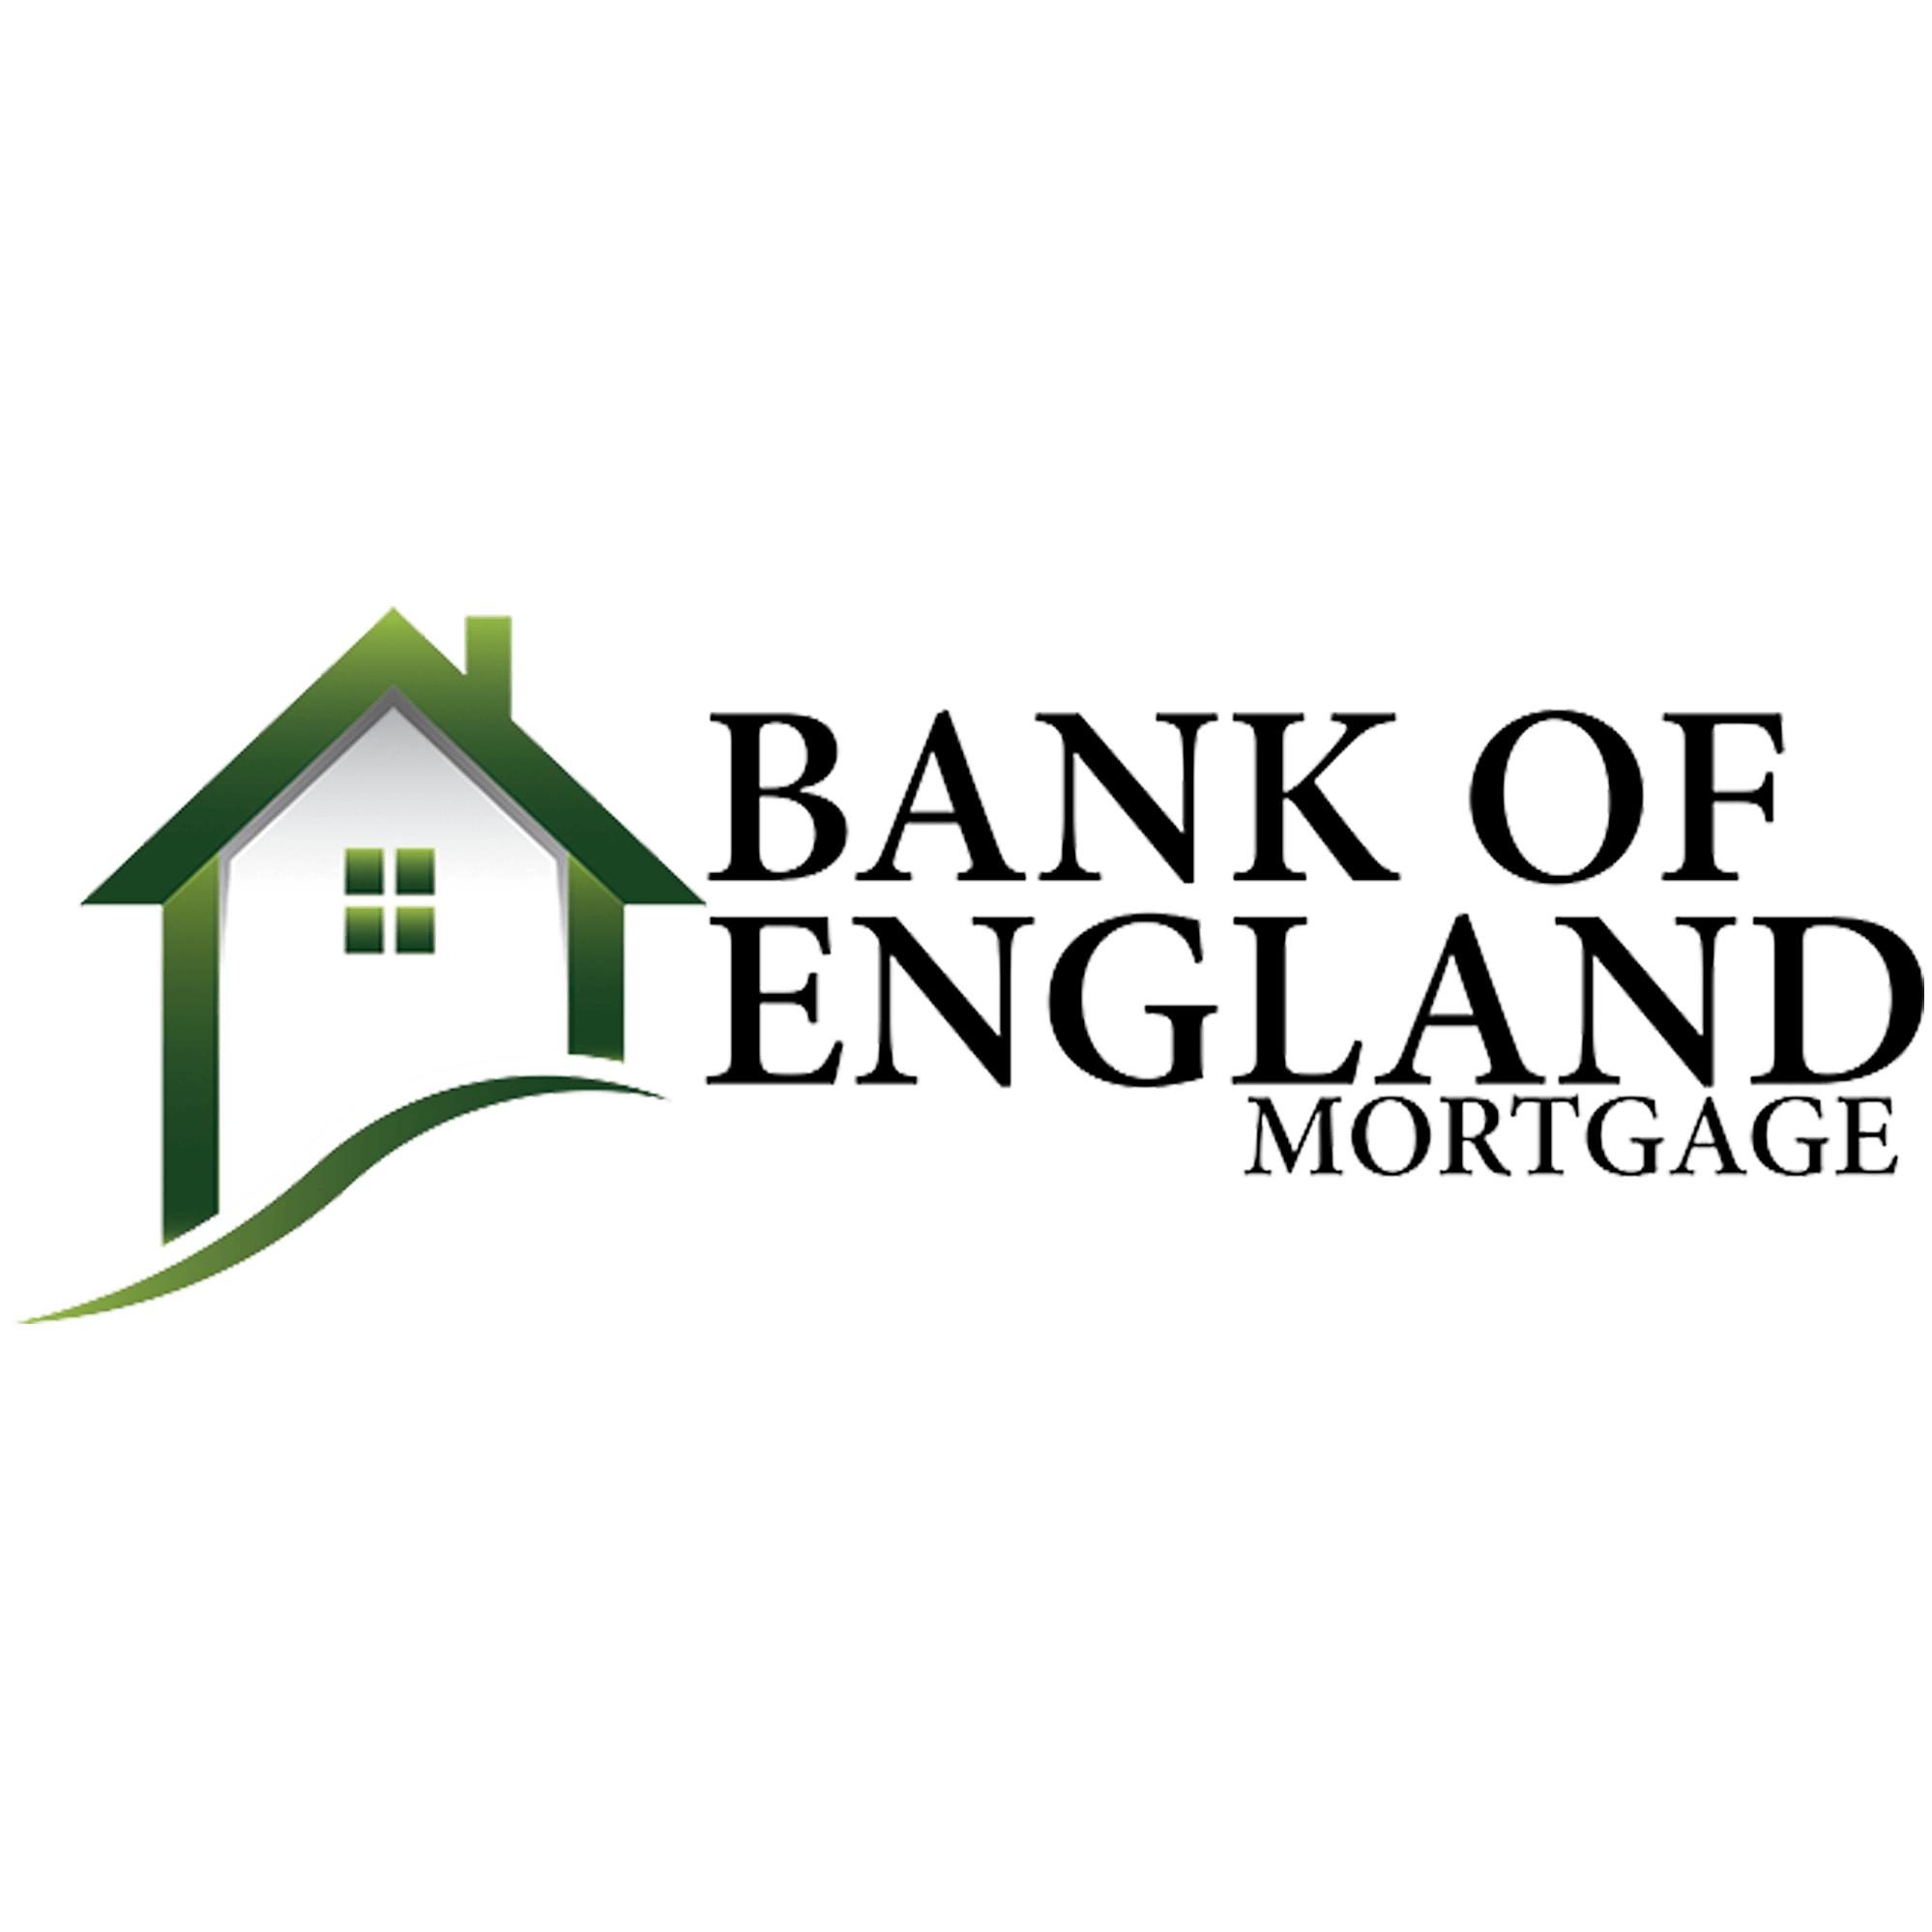 John Gremm | Bank of England Mortgage